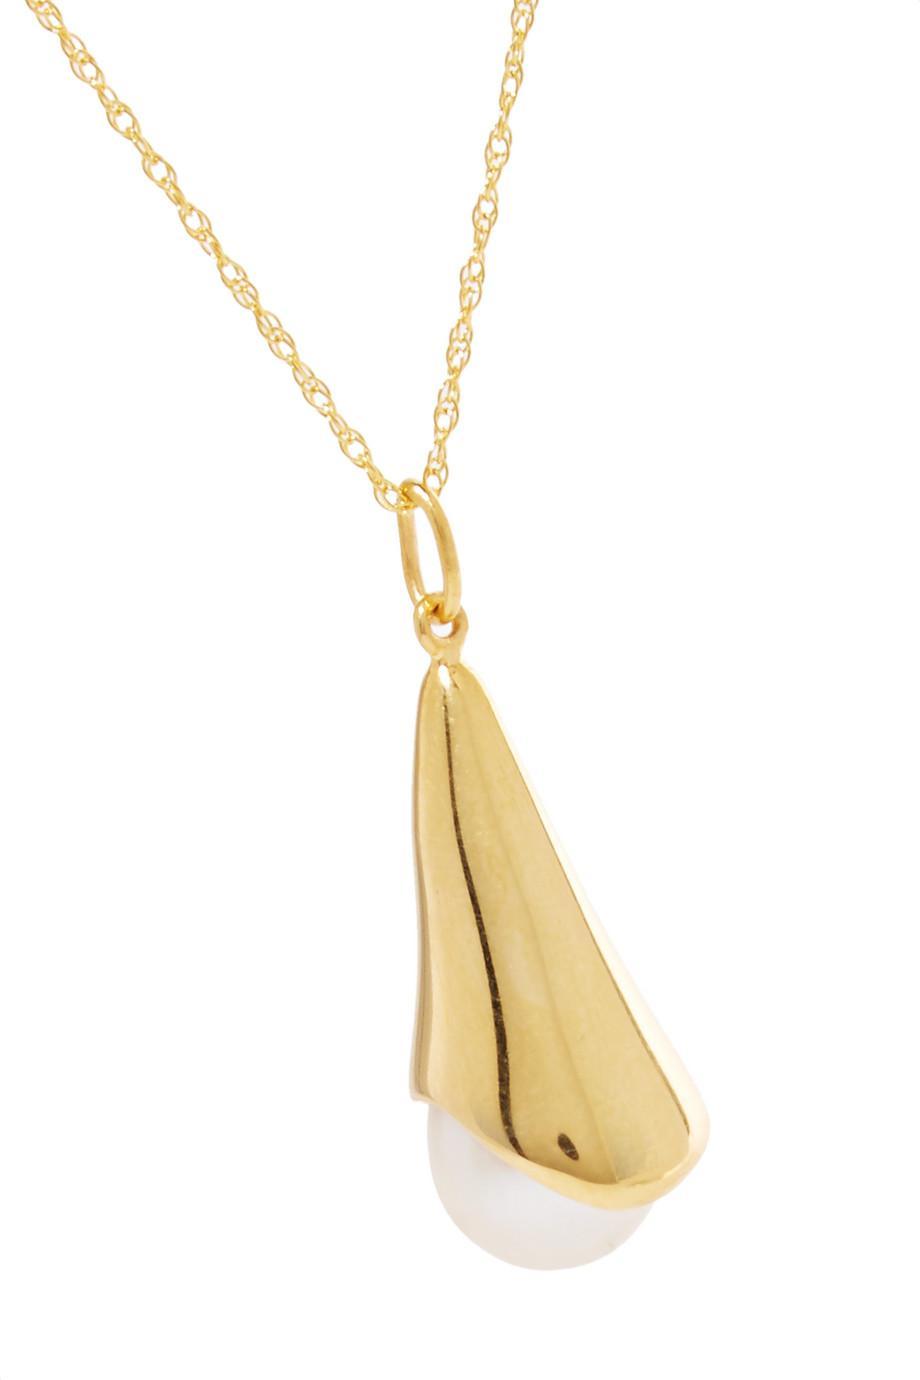 Sophie Buhai Gold Vermeil Necklace YLMAAvk9